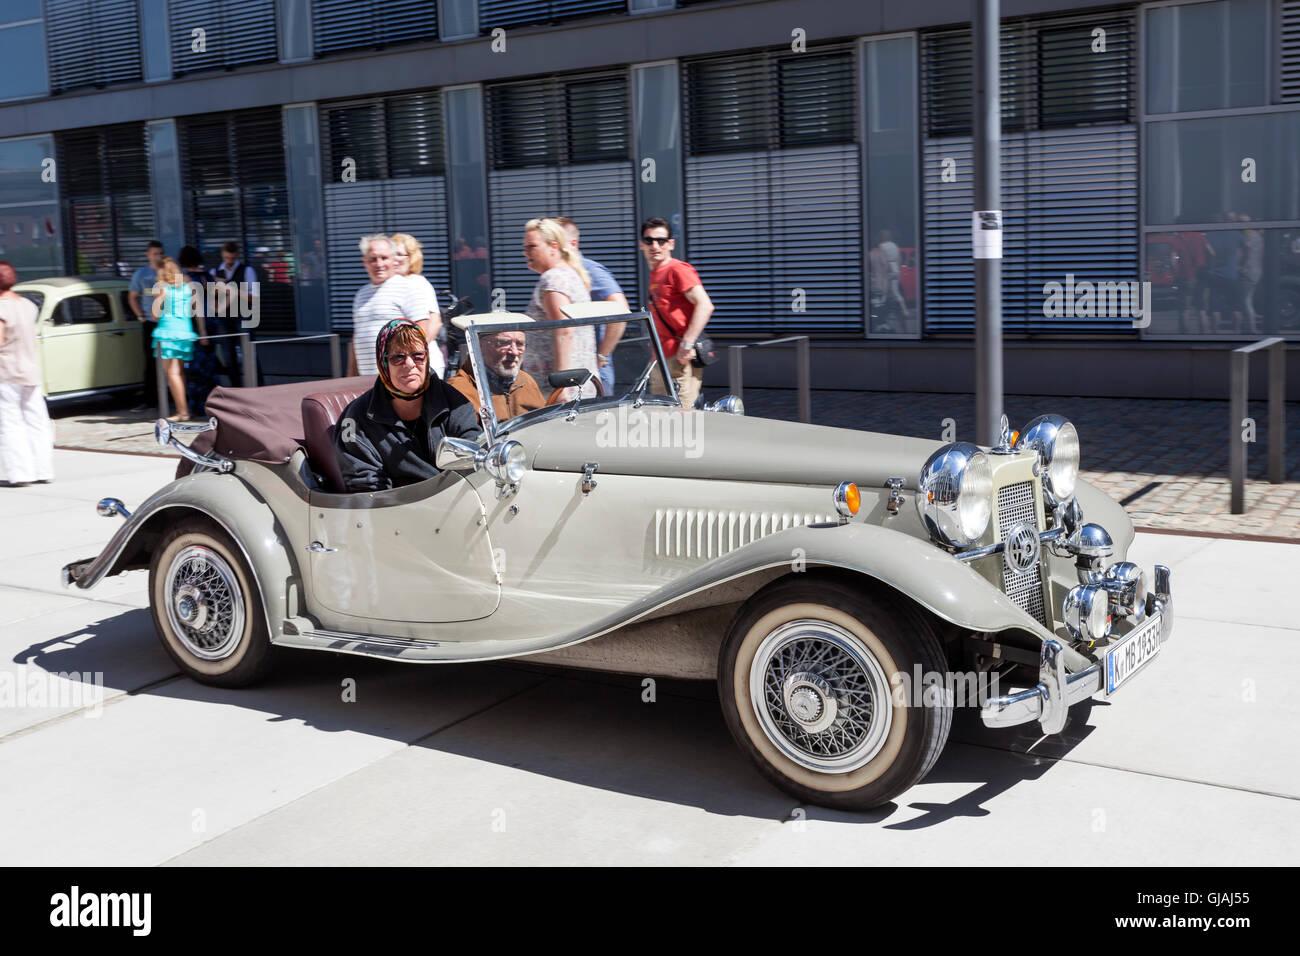 Historic Mercedes Benz Roadster - Stock Image